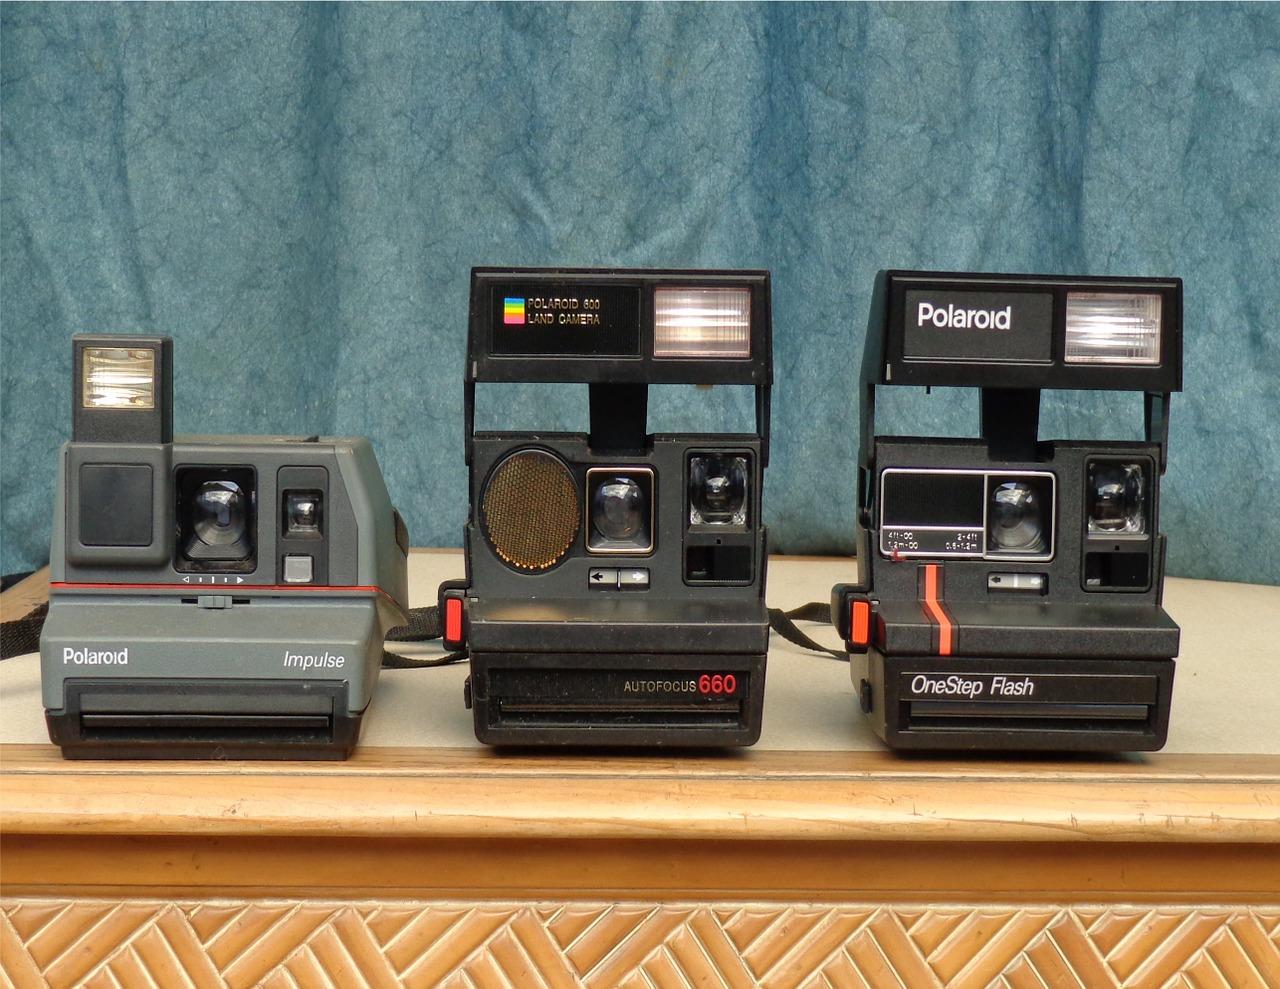 Fusion! Impossible Project übernimmt Polaroid!